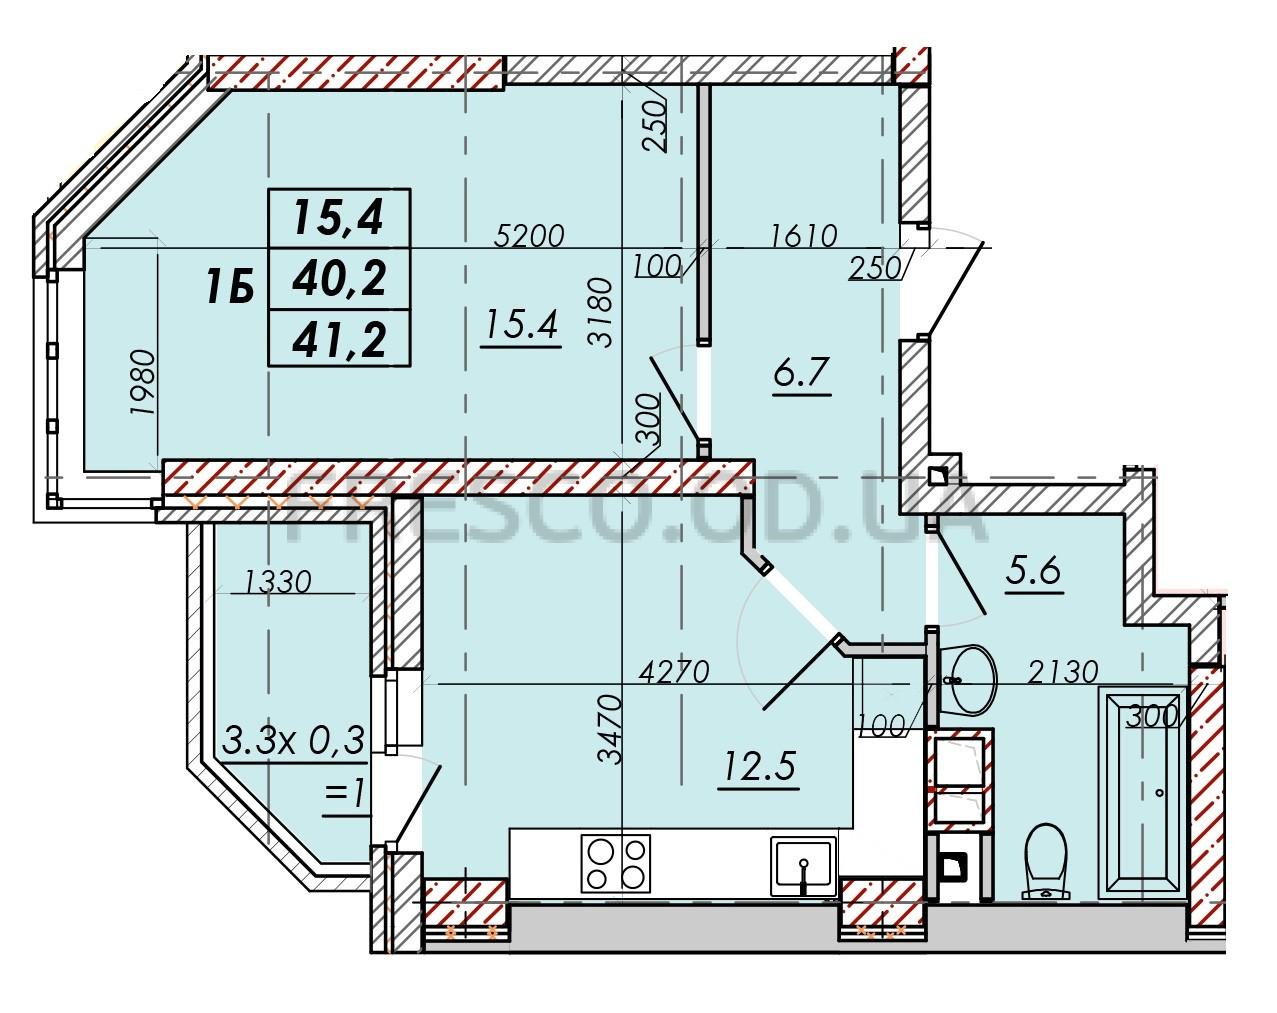 Однокомнатная - ЖК RealPark (Реал Парк)$26368Площадь:41,2m²